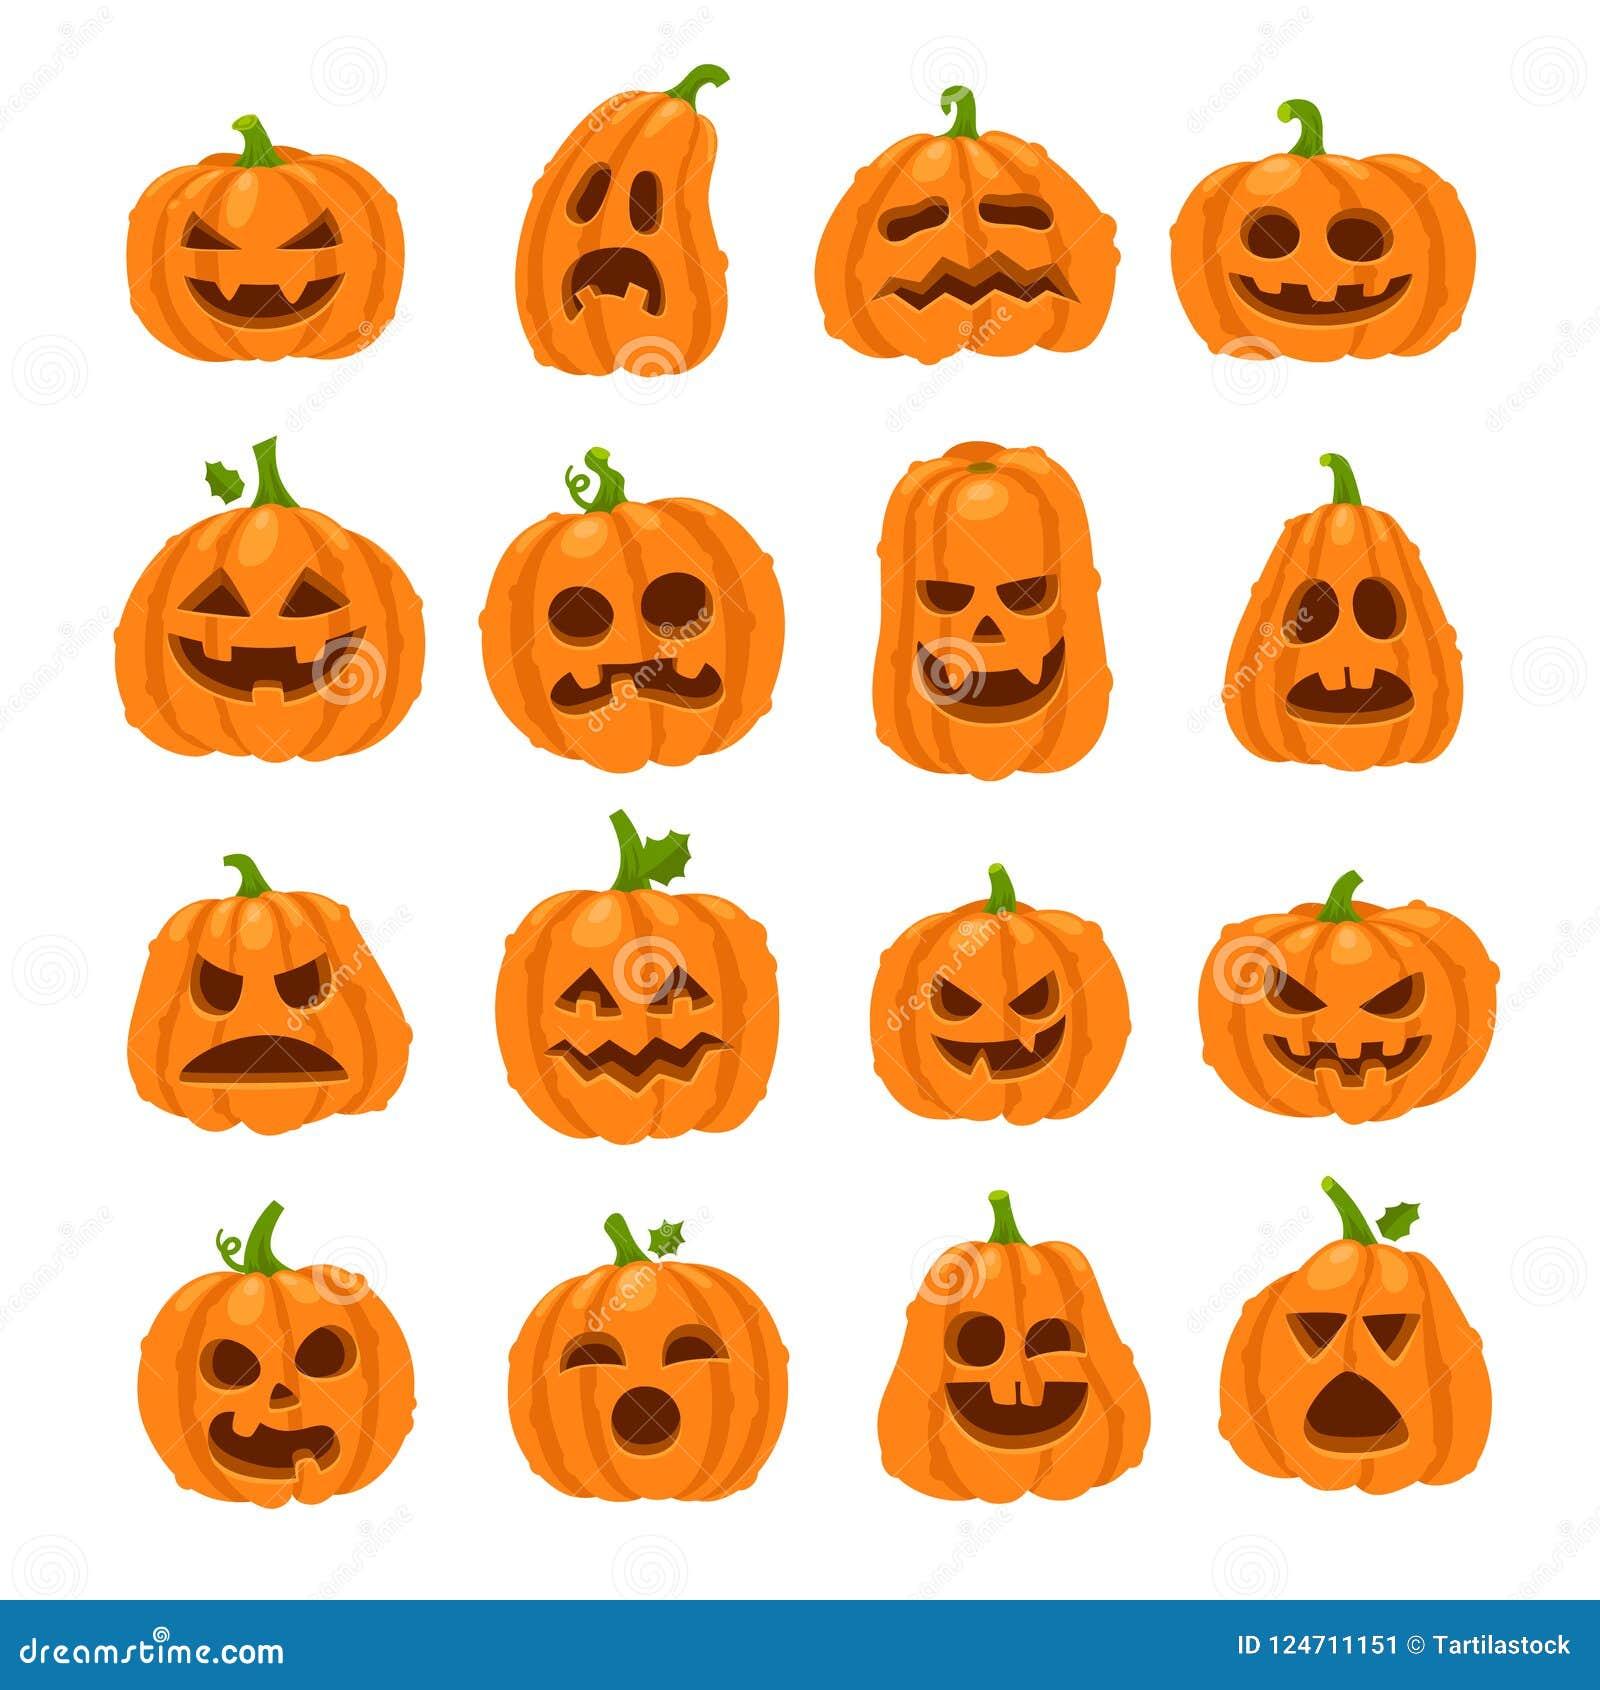 Cartoon Halloween Pumpkin Orange Pumpkins With Carving